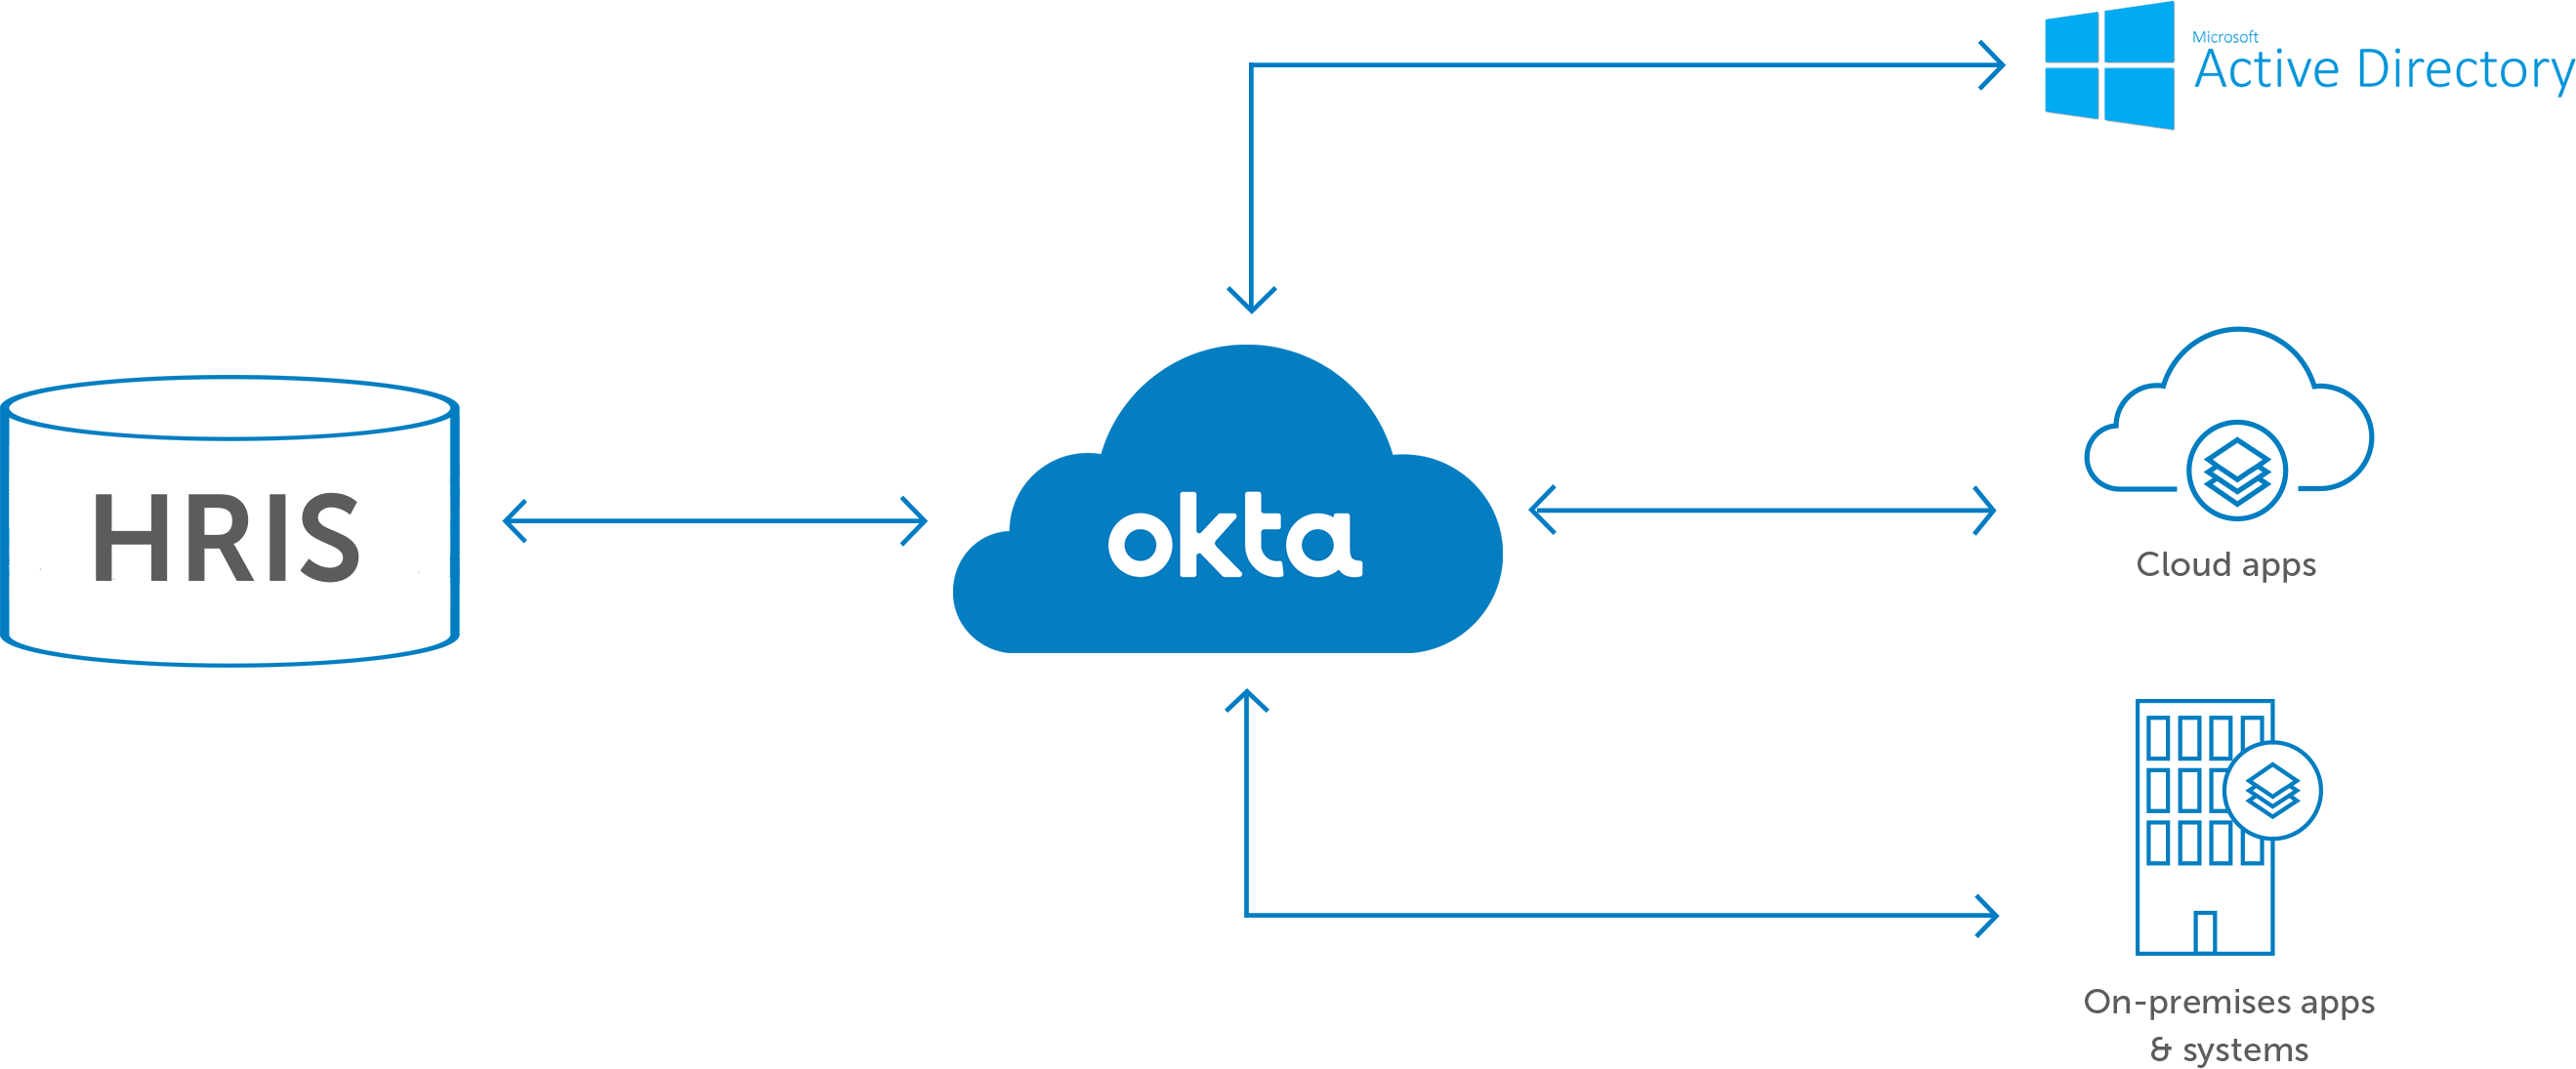 Human Resources Information Systems | Okta